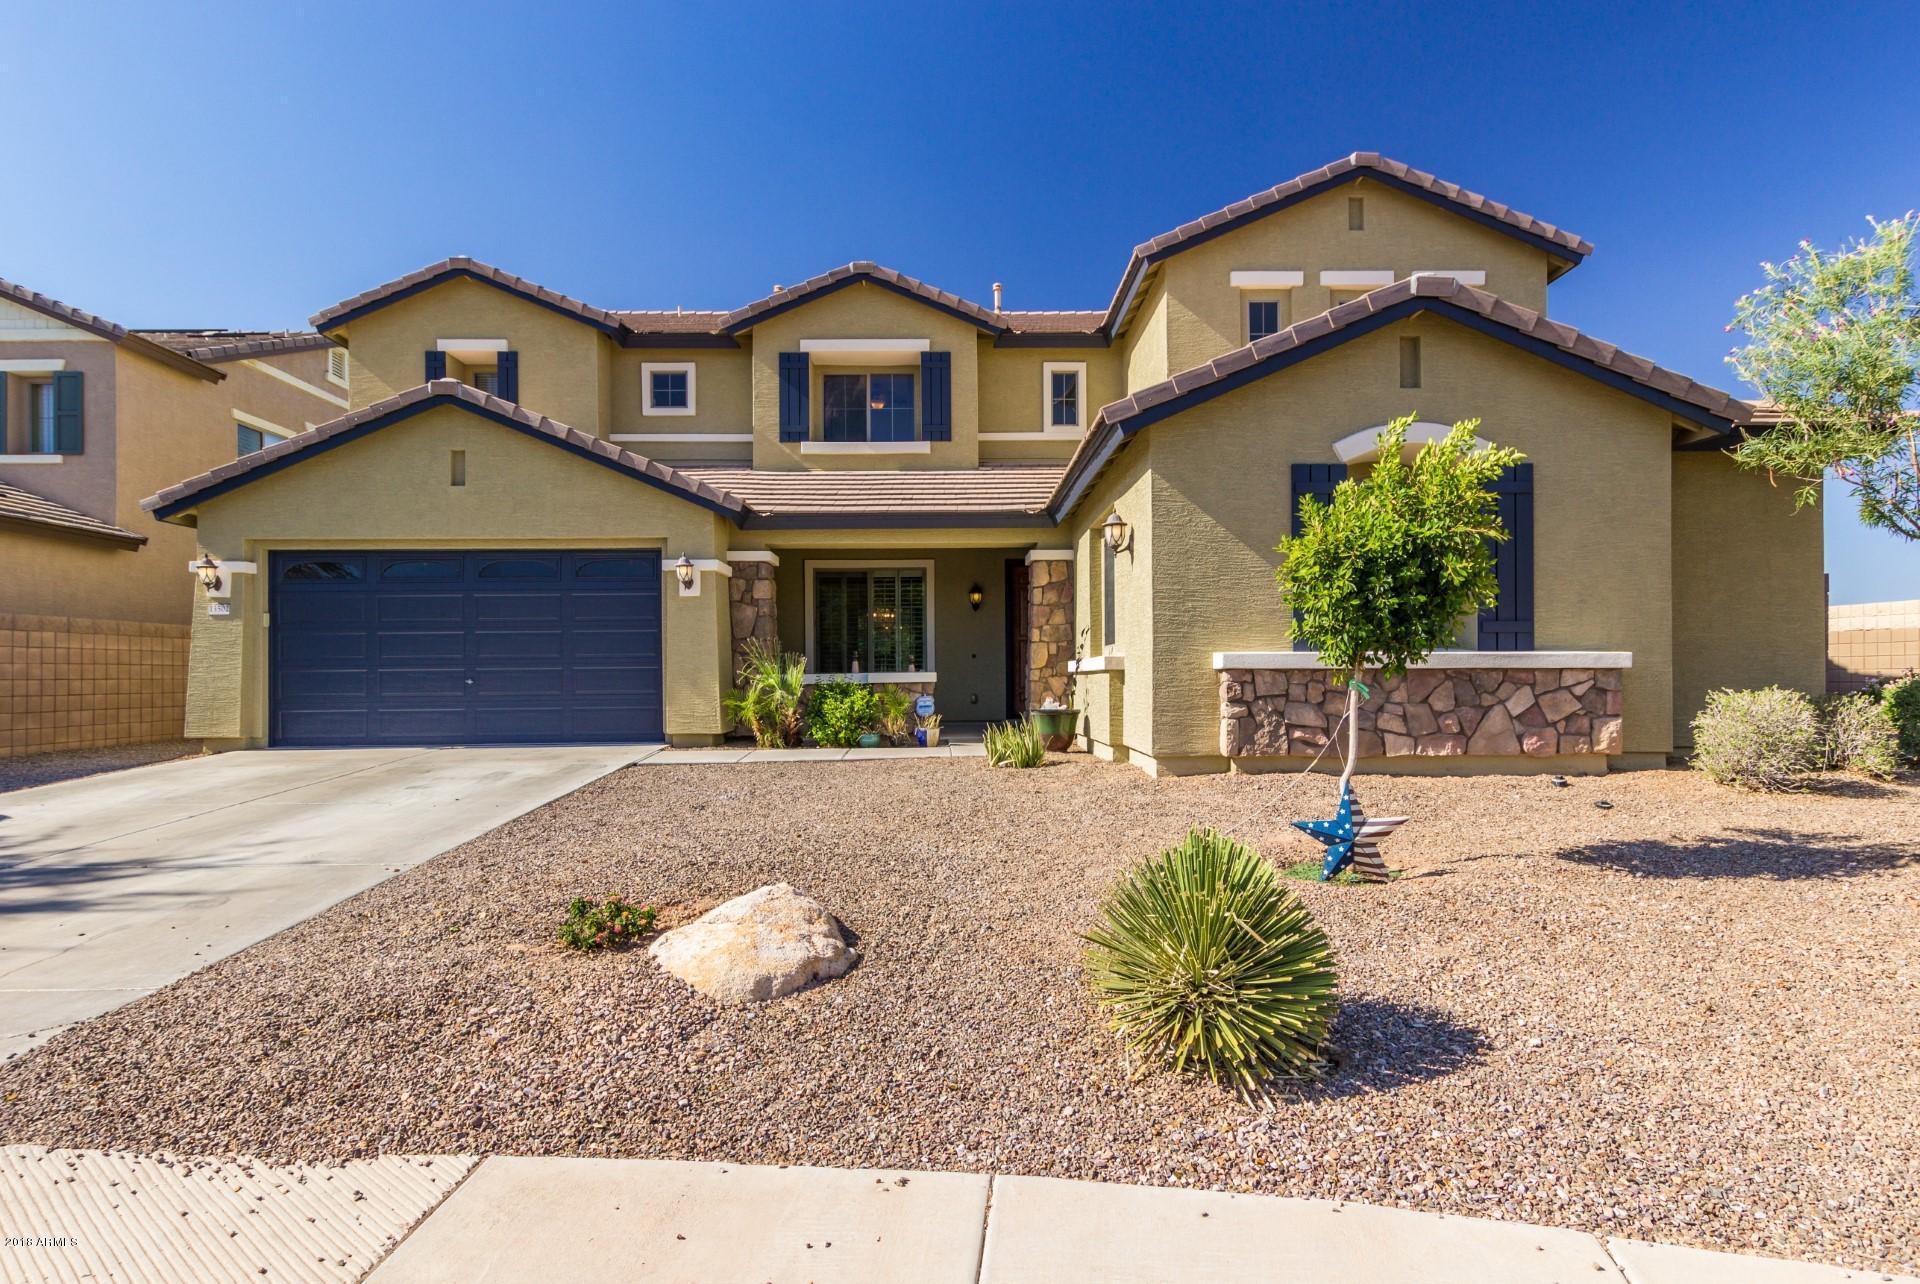 Photo of 13502 W MONTEREY Way, Avondale, AZ 85392